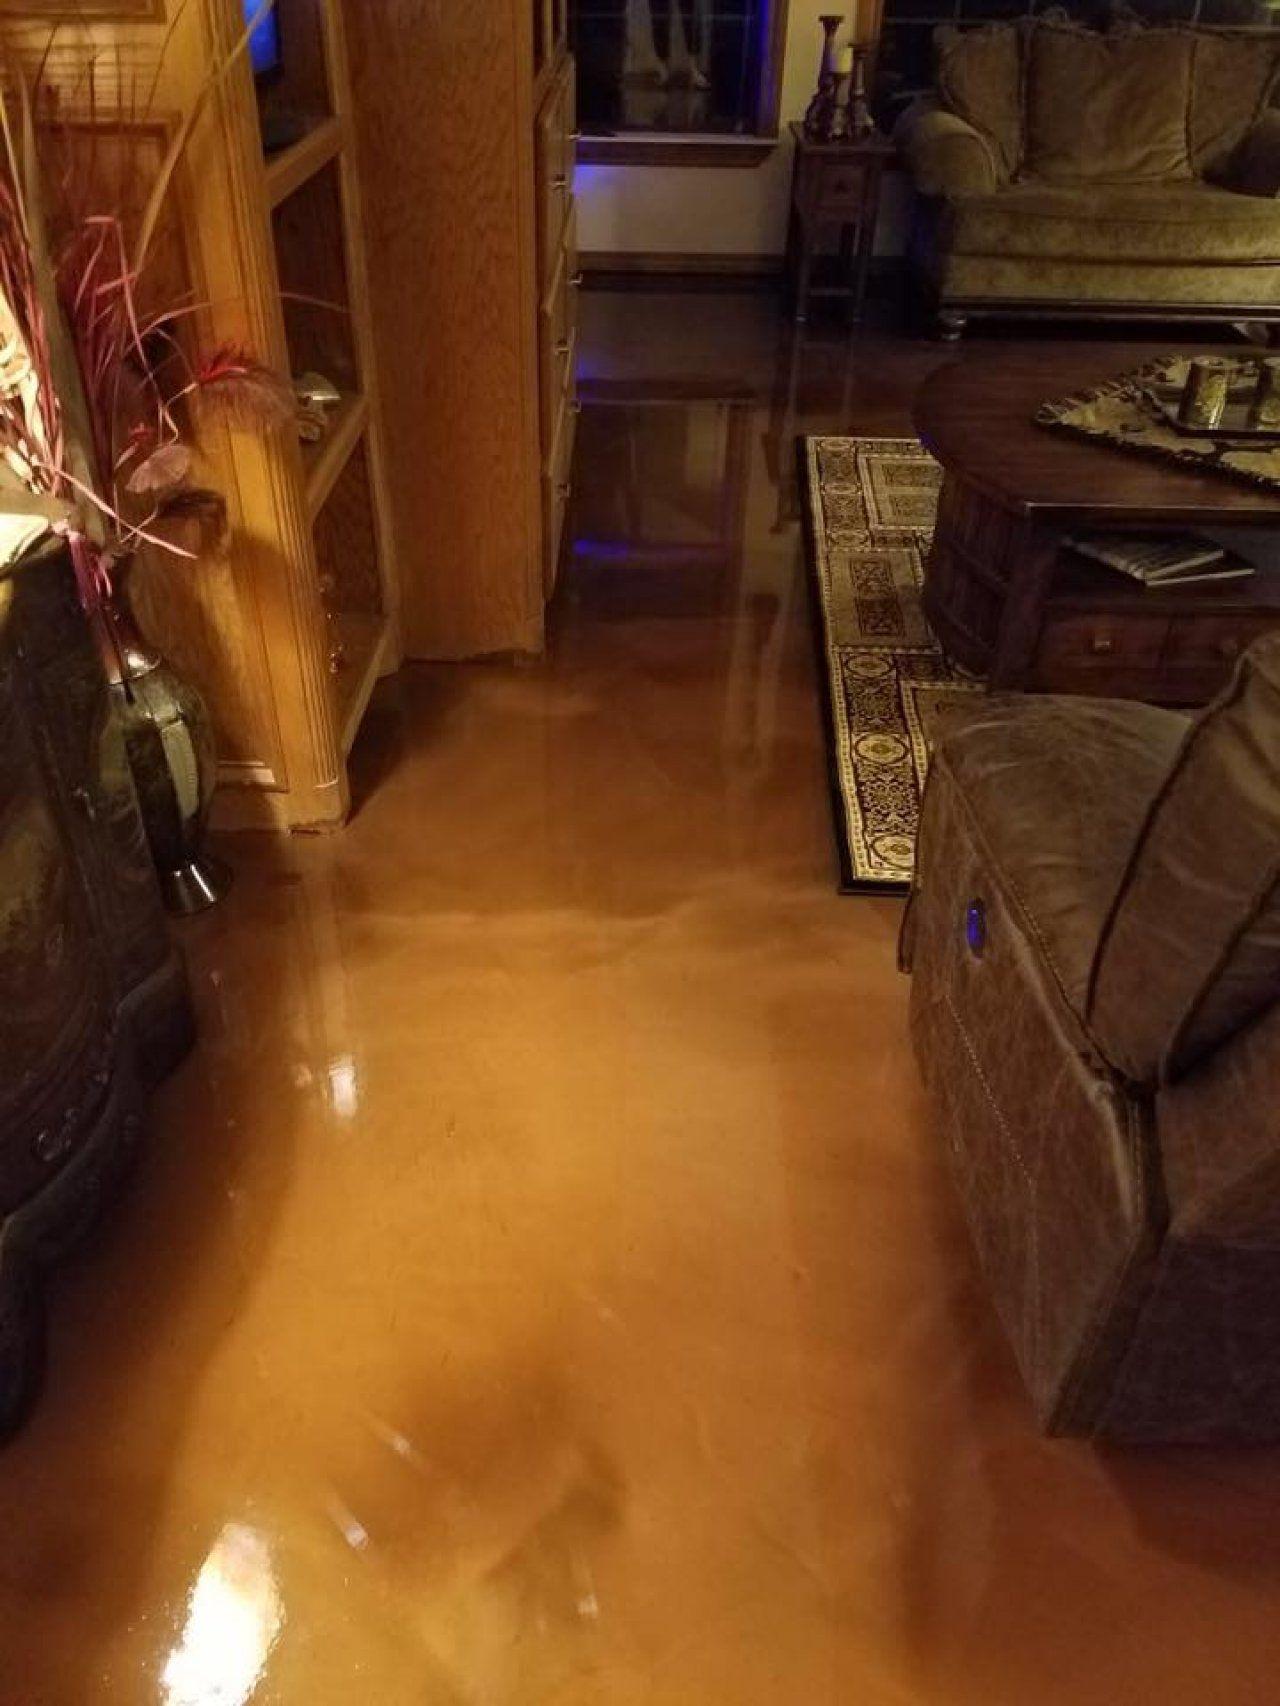 Metallic Marble Epoxy In Living Room In Oklahoma City Oklahoma - Flooring contractors okc